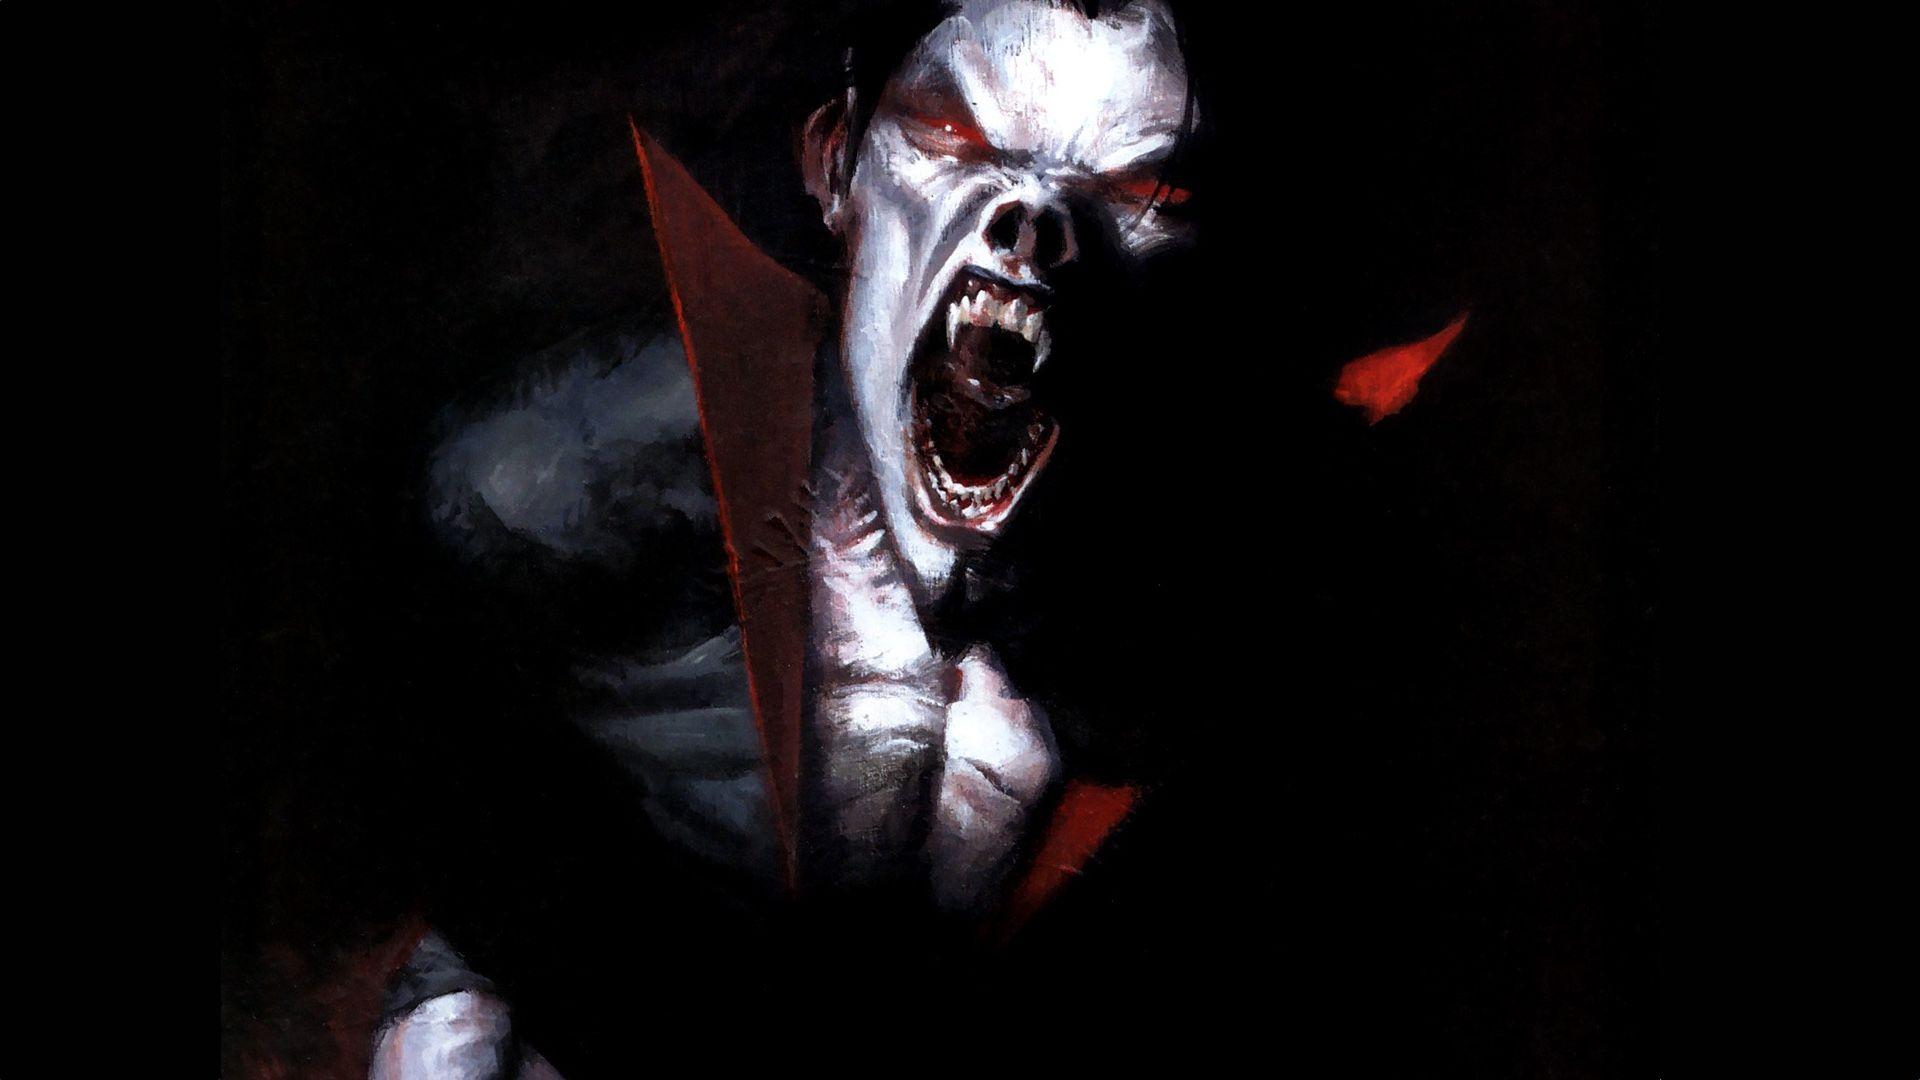 Morbius Halloween Costume Idea 2019